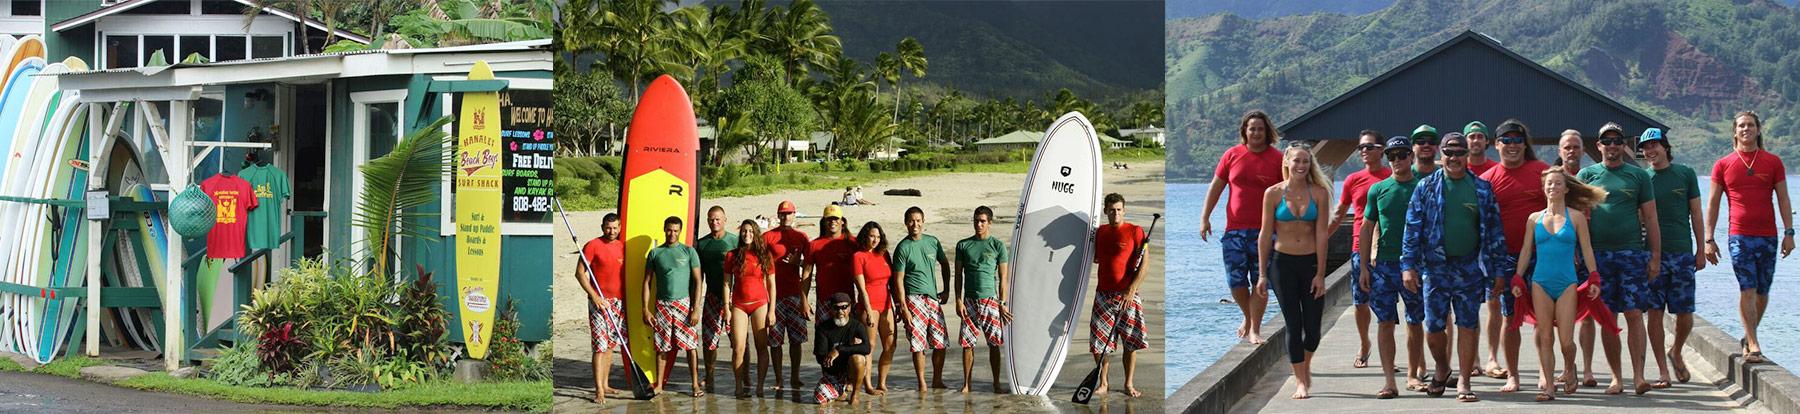 Hanalei Kauai Surf Rentals